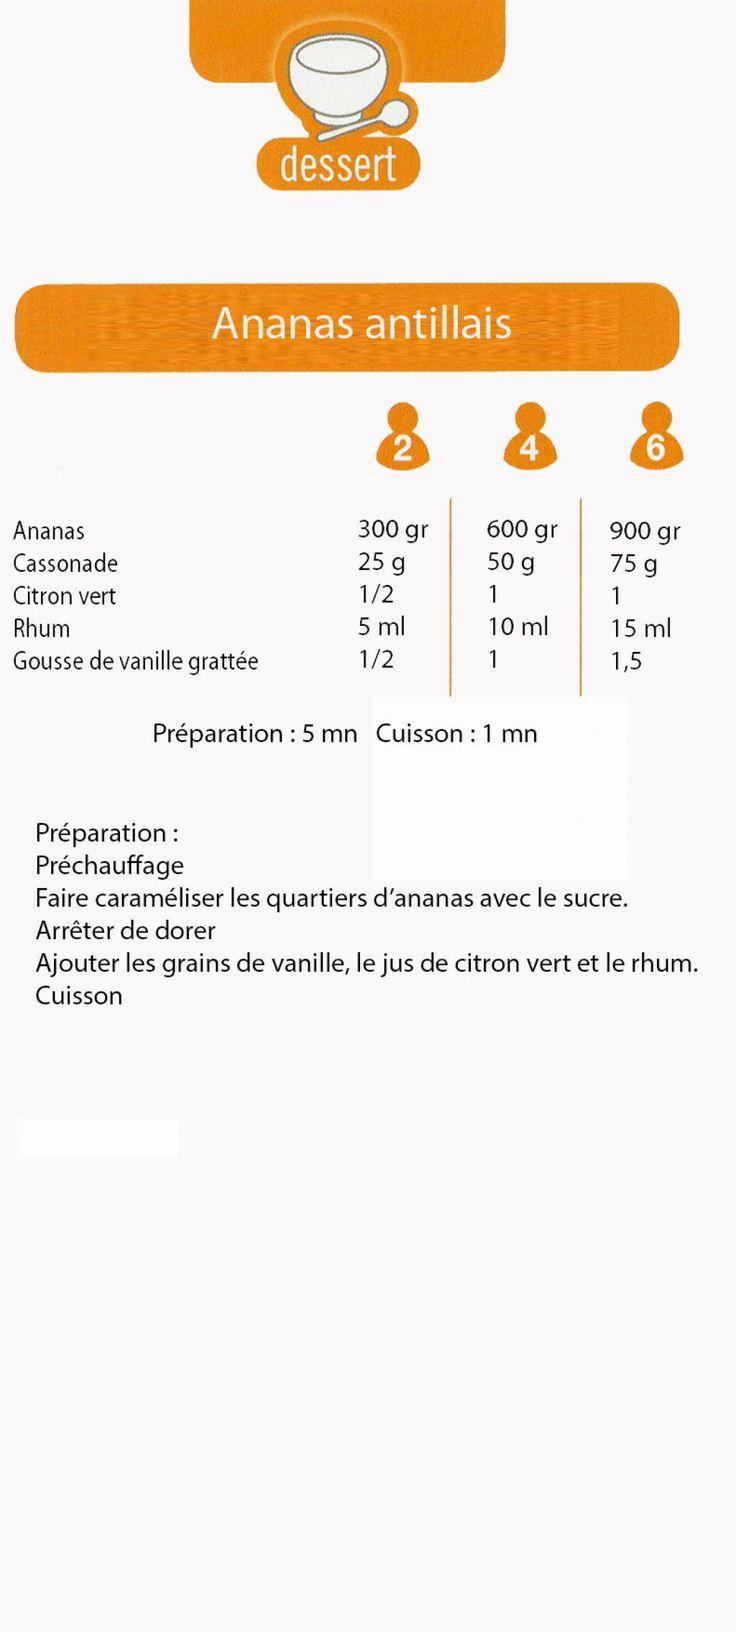 Cookeo :: Ananas antillais http://www.forum-cookeo.com/t1703-Ananas-antillais.htm